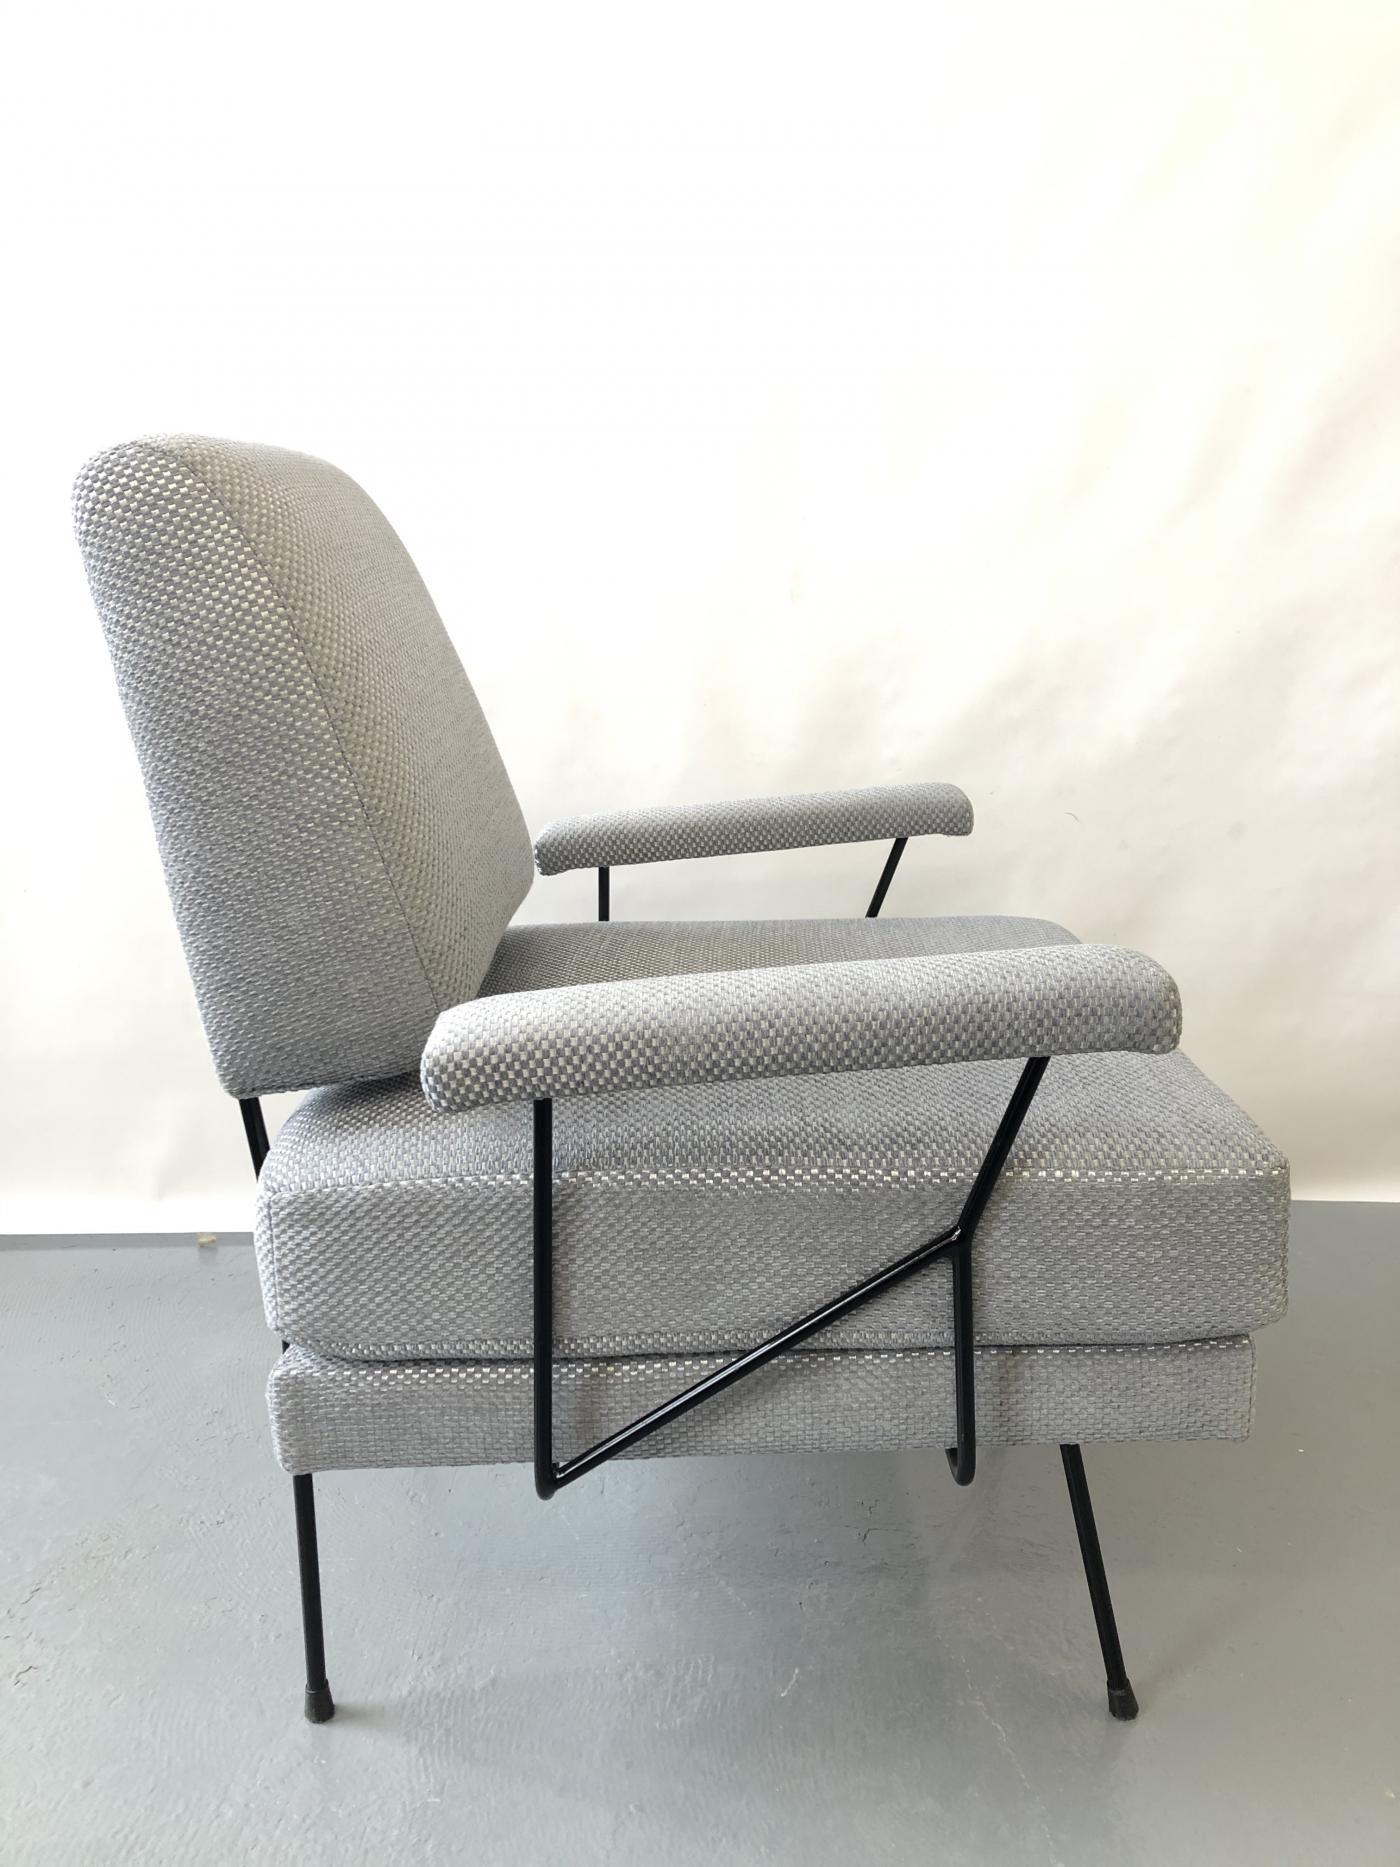 Pair of Mid Century Modern Iron Chairs.